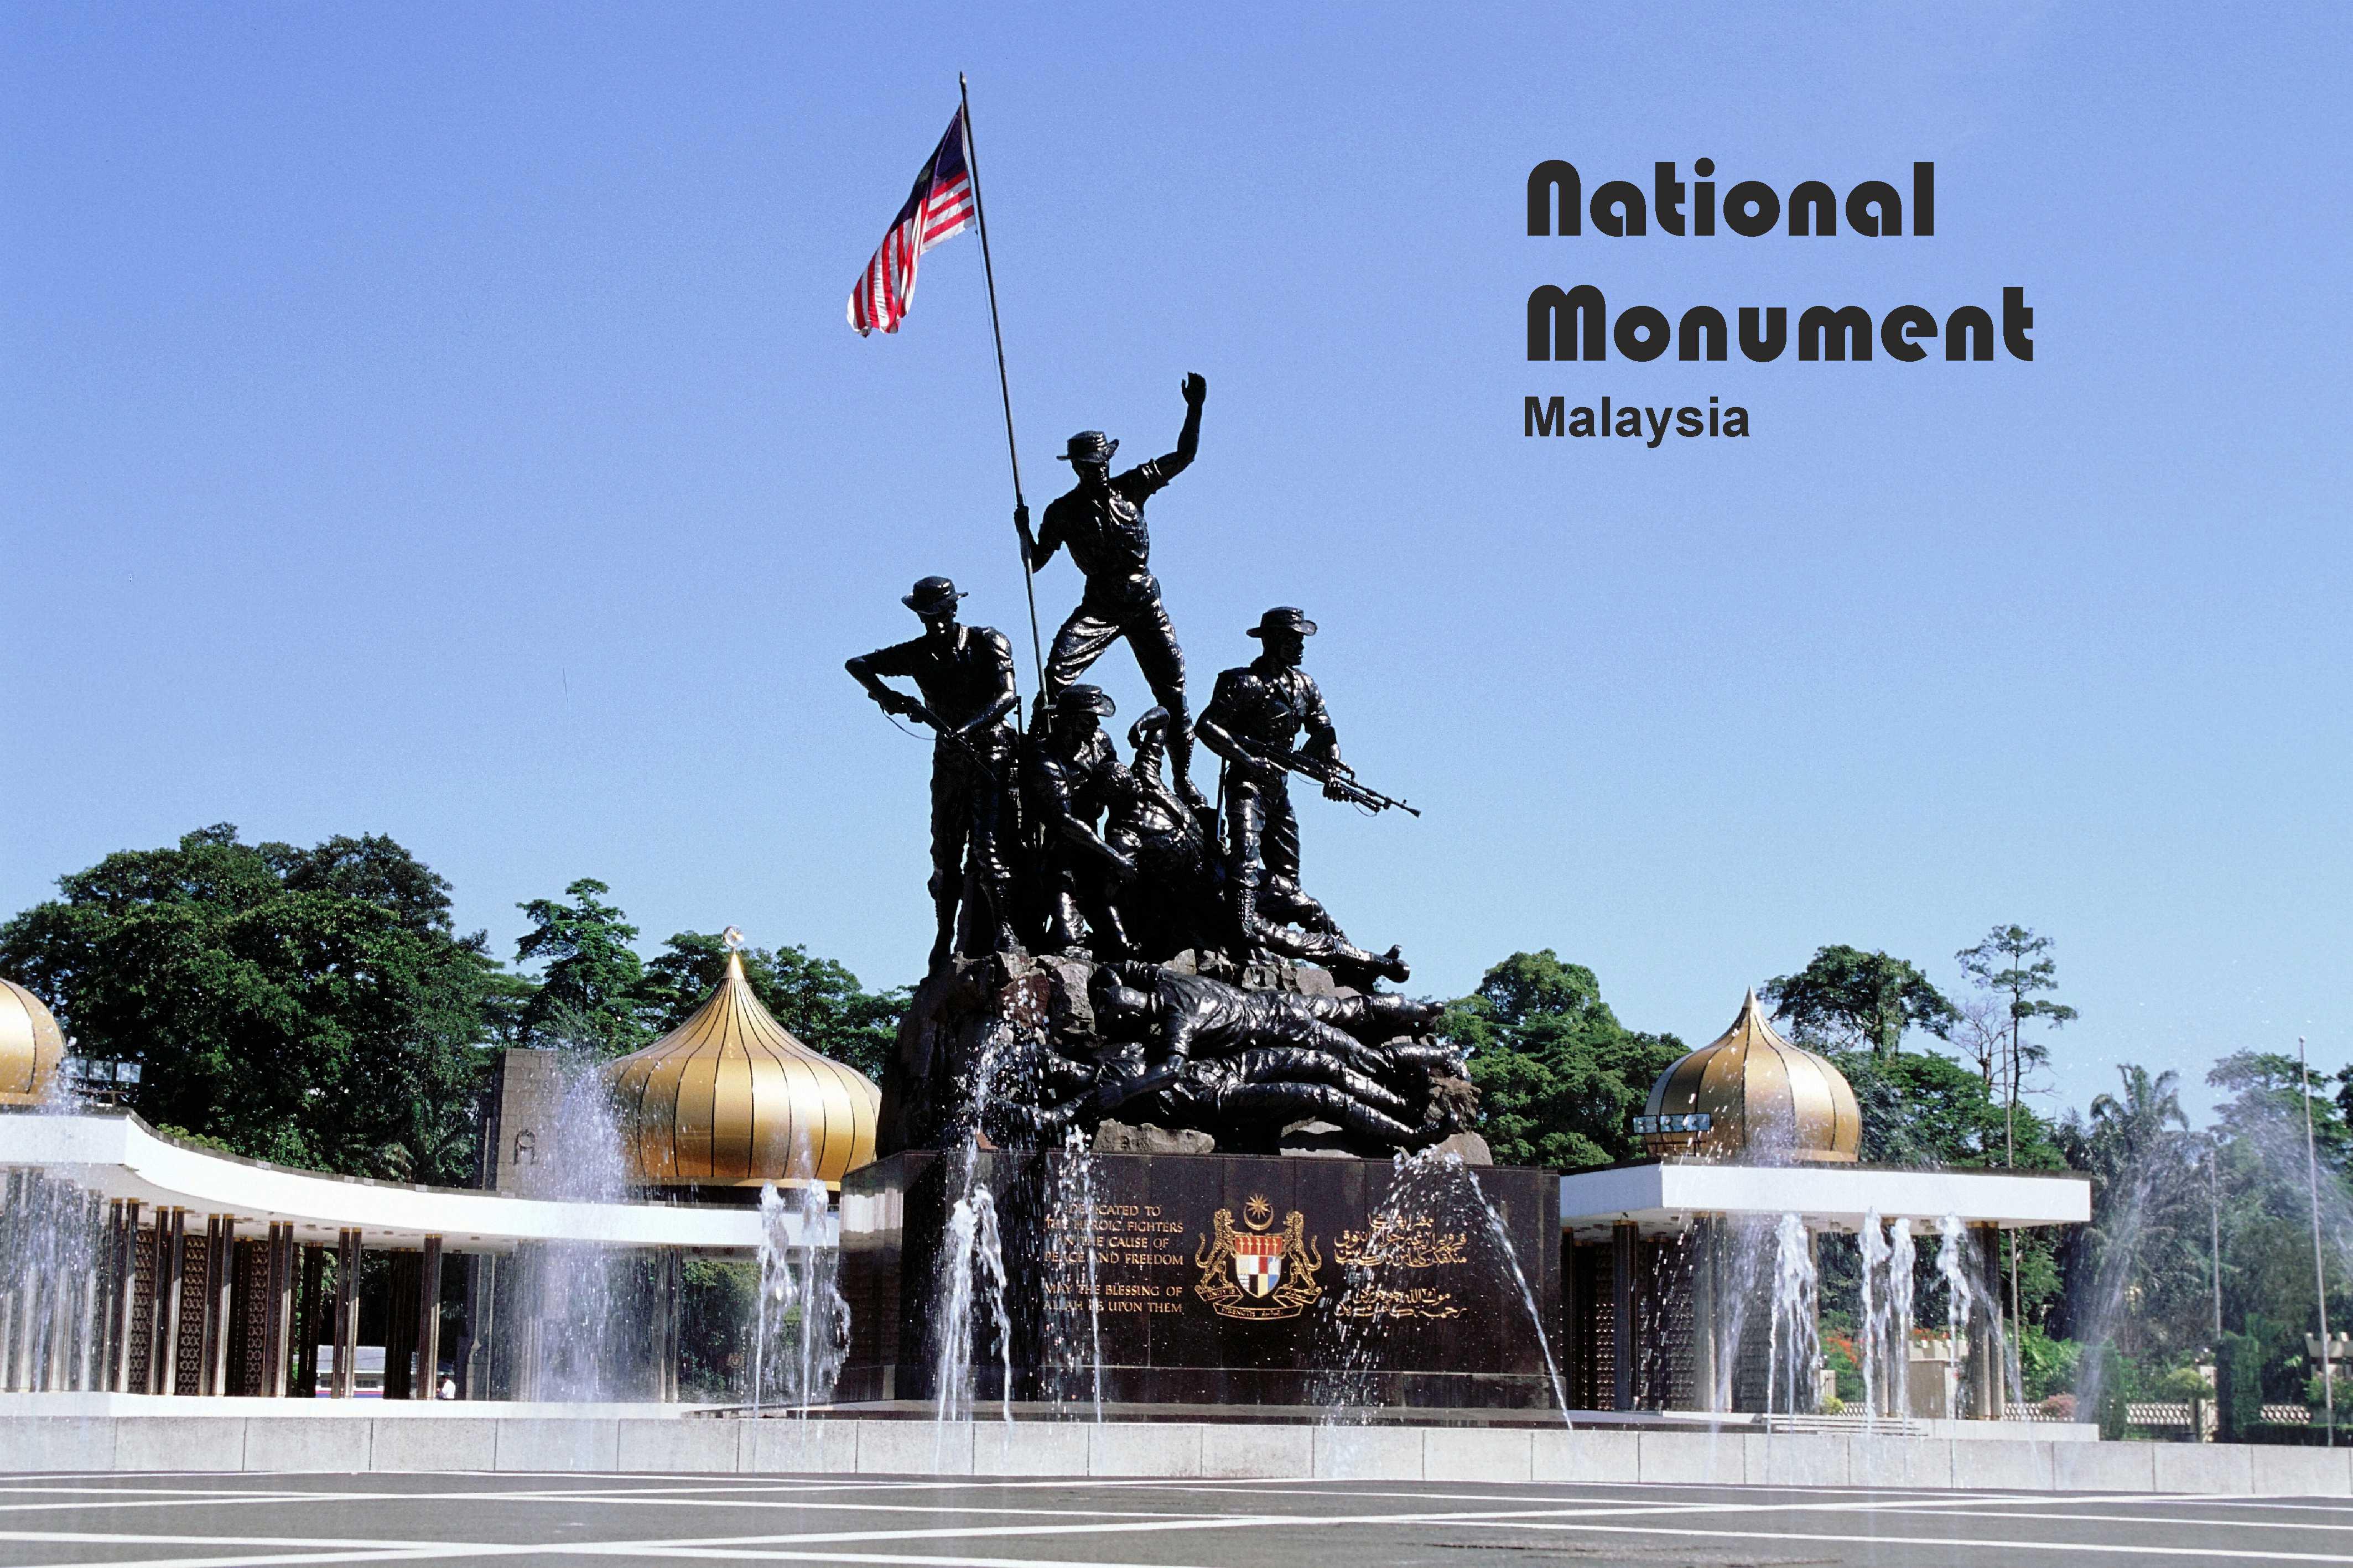 national-monumen-malaysia-2